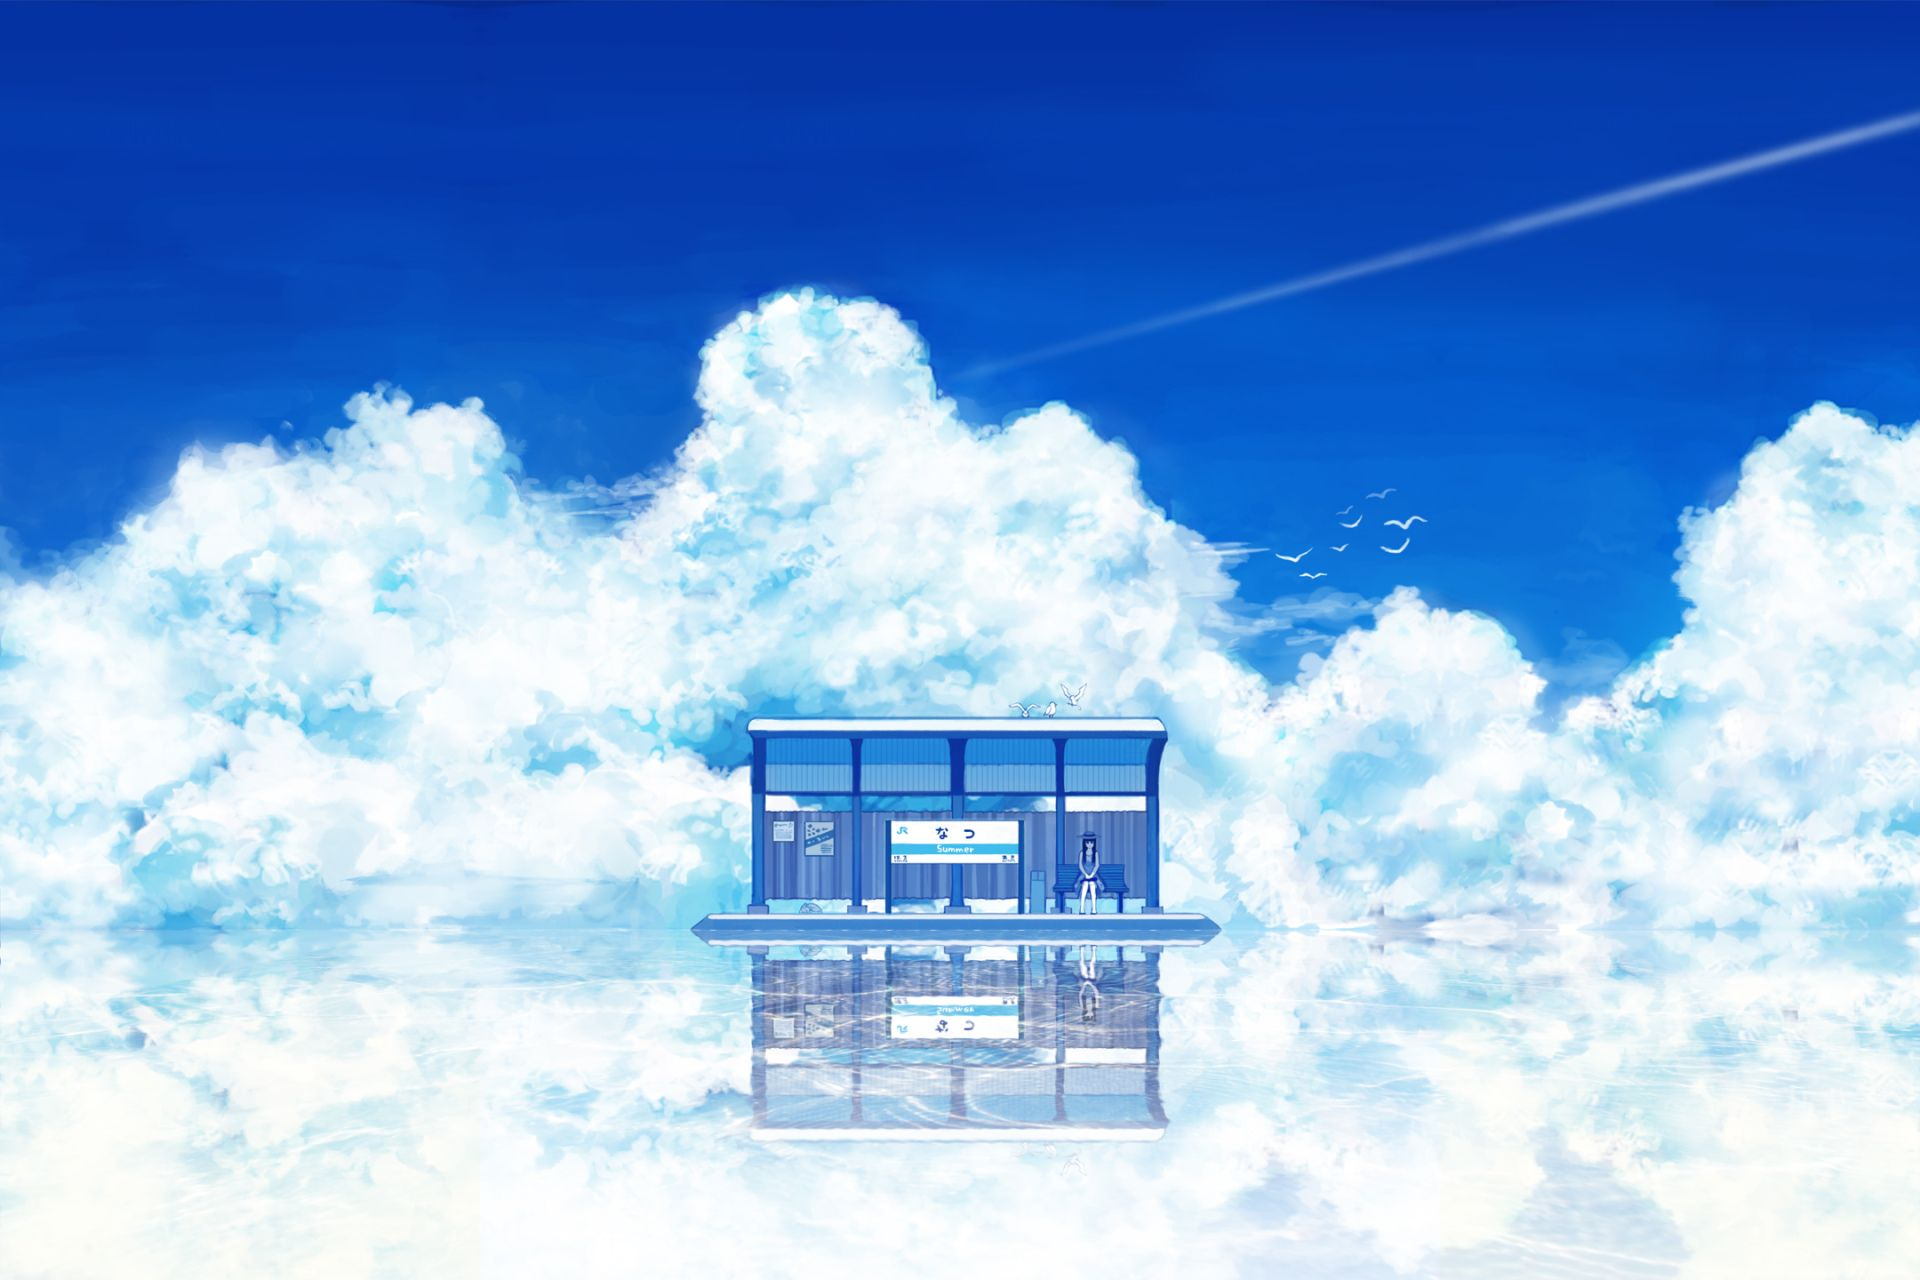 Anime Scenic Wallpaper Scenery Wallpaper Anime Scenery Anime Scenery Wallpaper